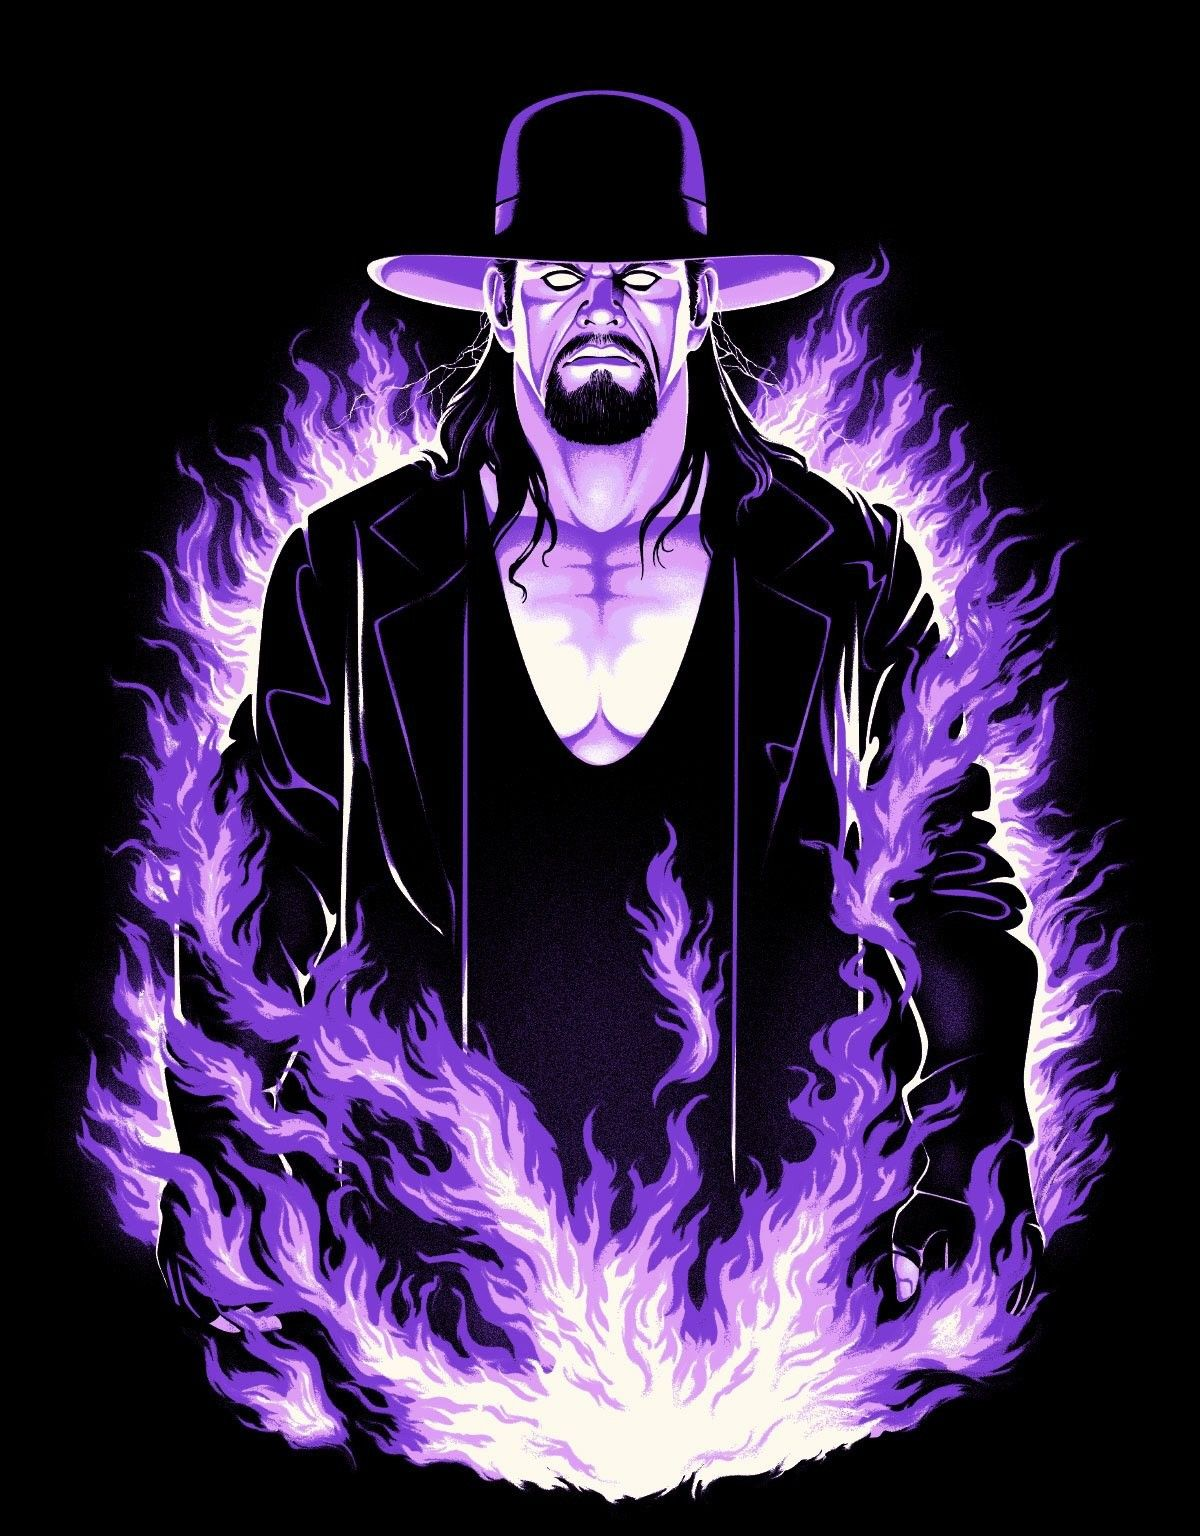 Pin By Geo Pimpiriz On Wrestling Undertaker Wwe Wwe Pictures Wwe Wallpapers